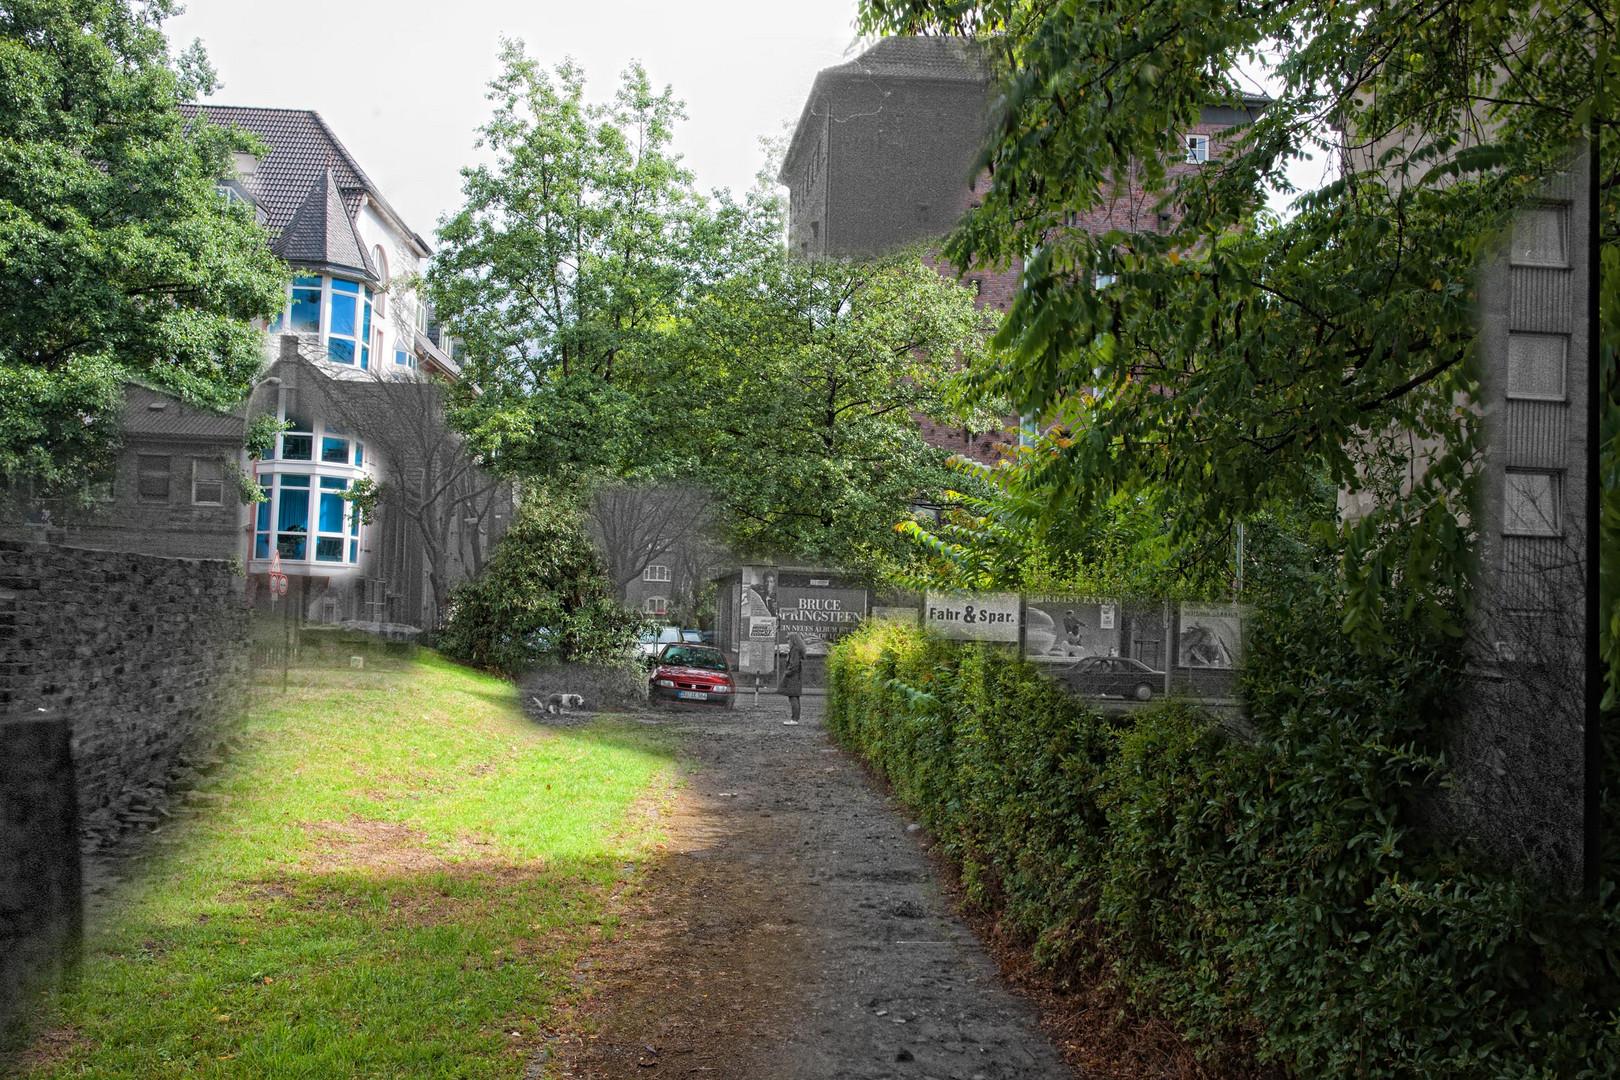 Hinterhof Idylle mit Bunker, Duisburg Bruckhausen 1987/2011